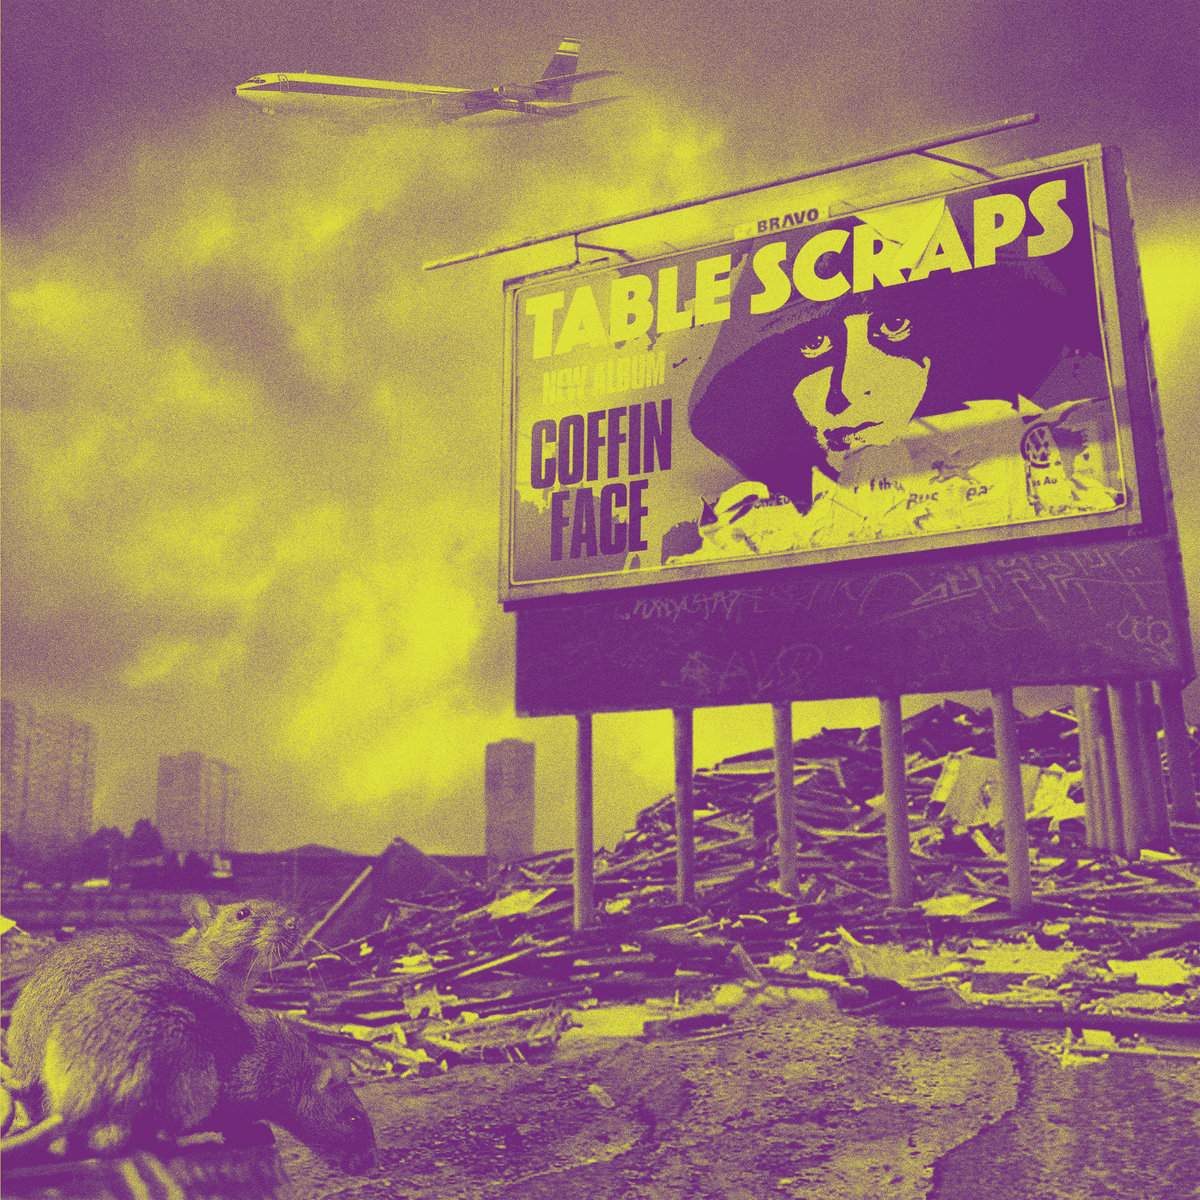 Table Scraps - Coffin Face